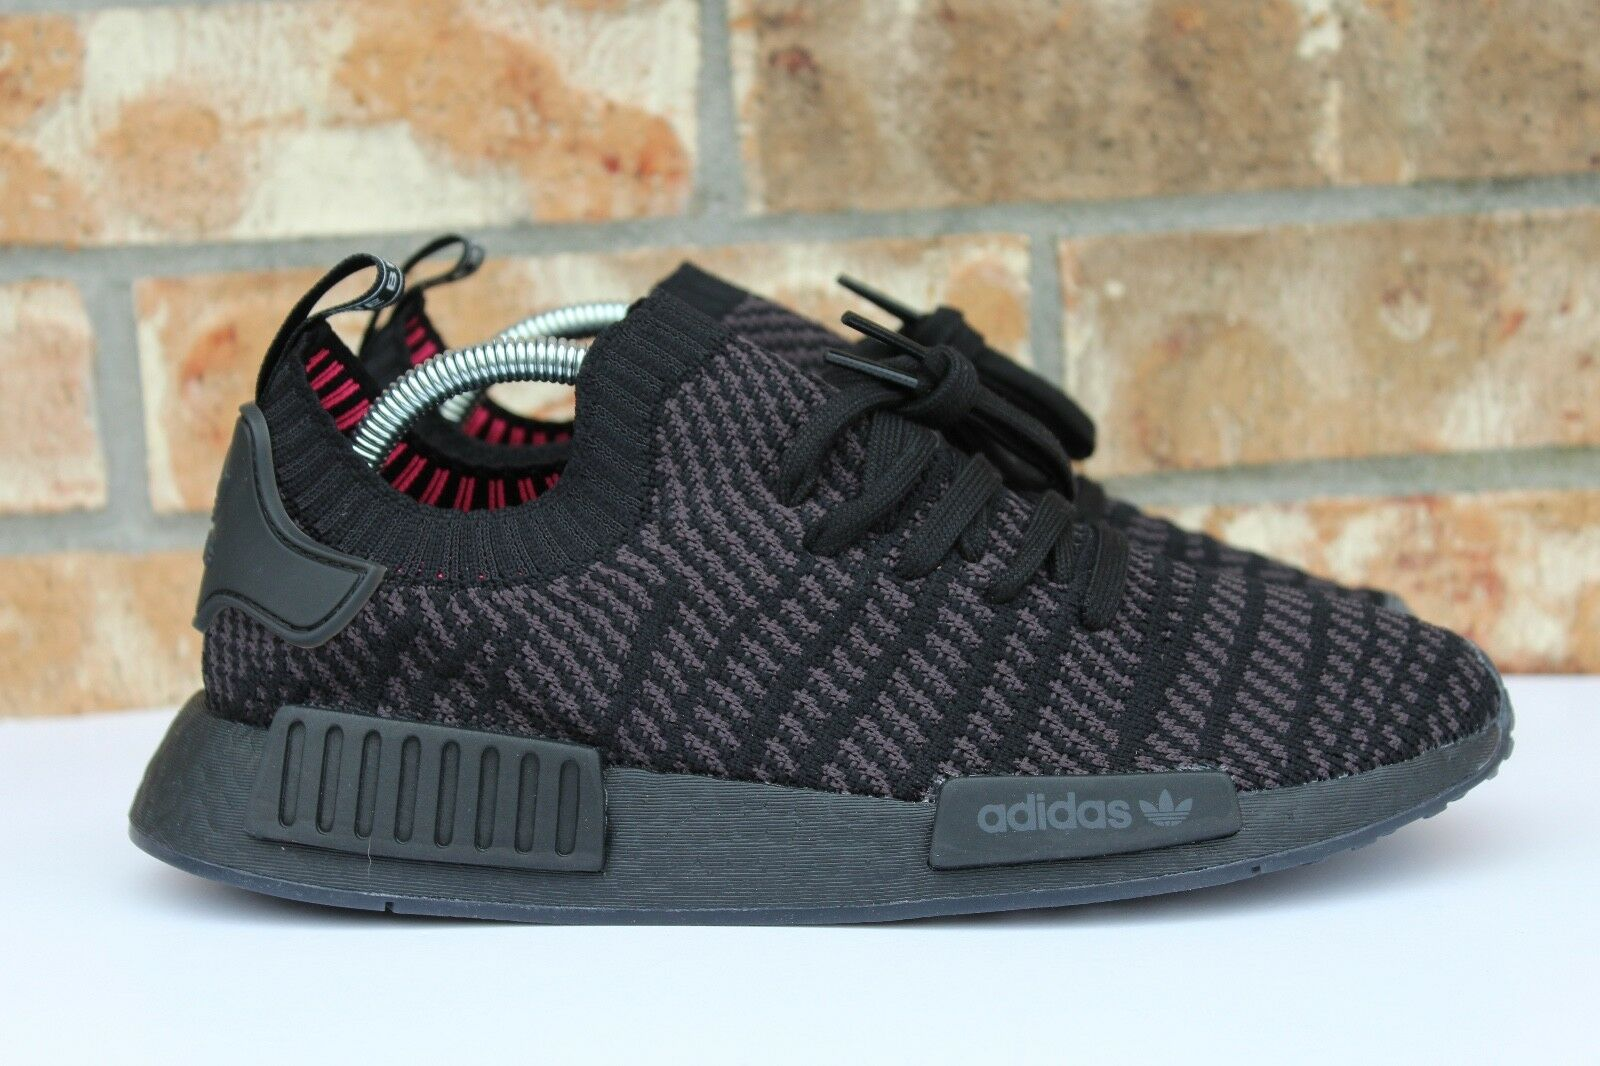 Adidas Men's NMD R1 GUM Pack Sole PK Primeknit Boost Triple